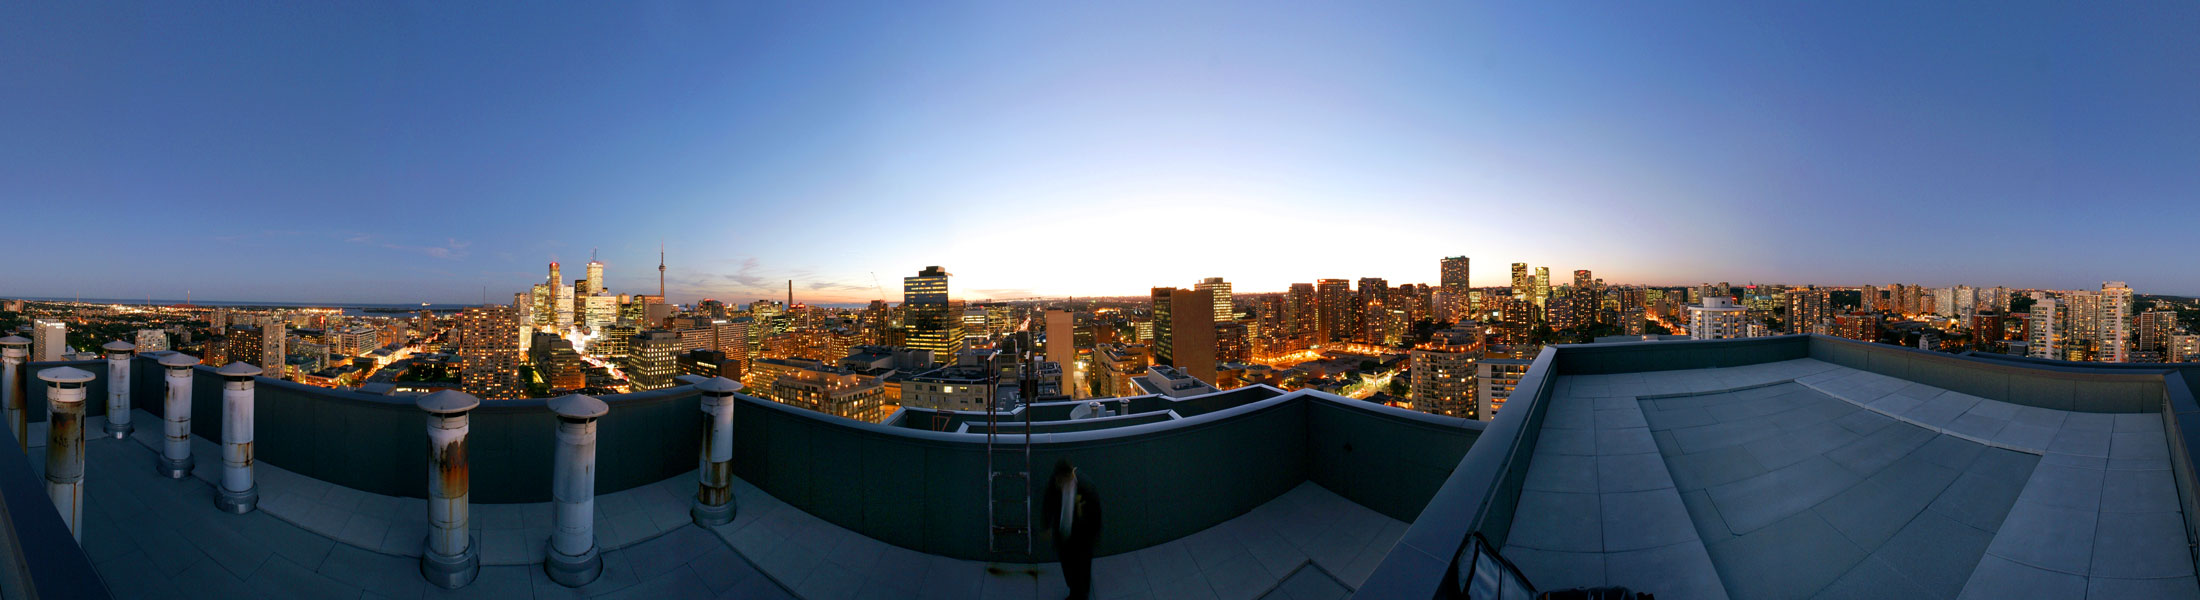 Toronto Skyline Toronto Skyline Pictures